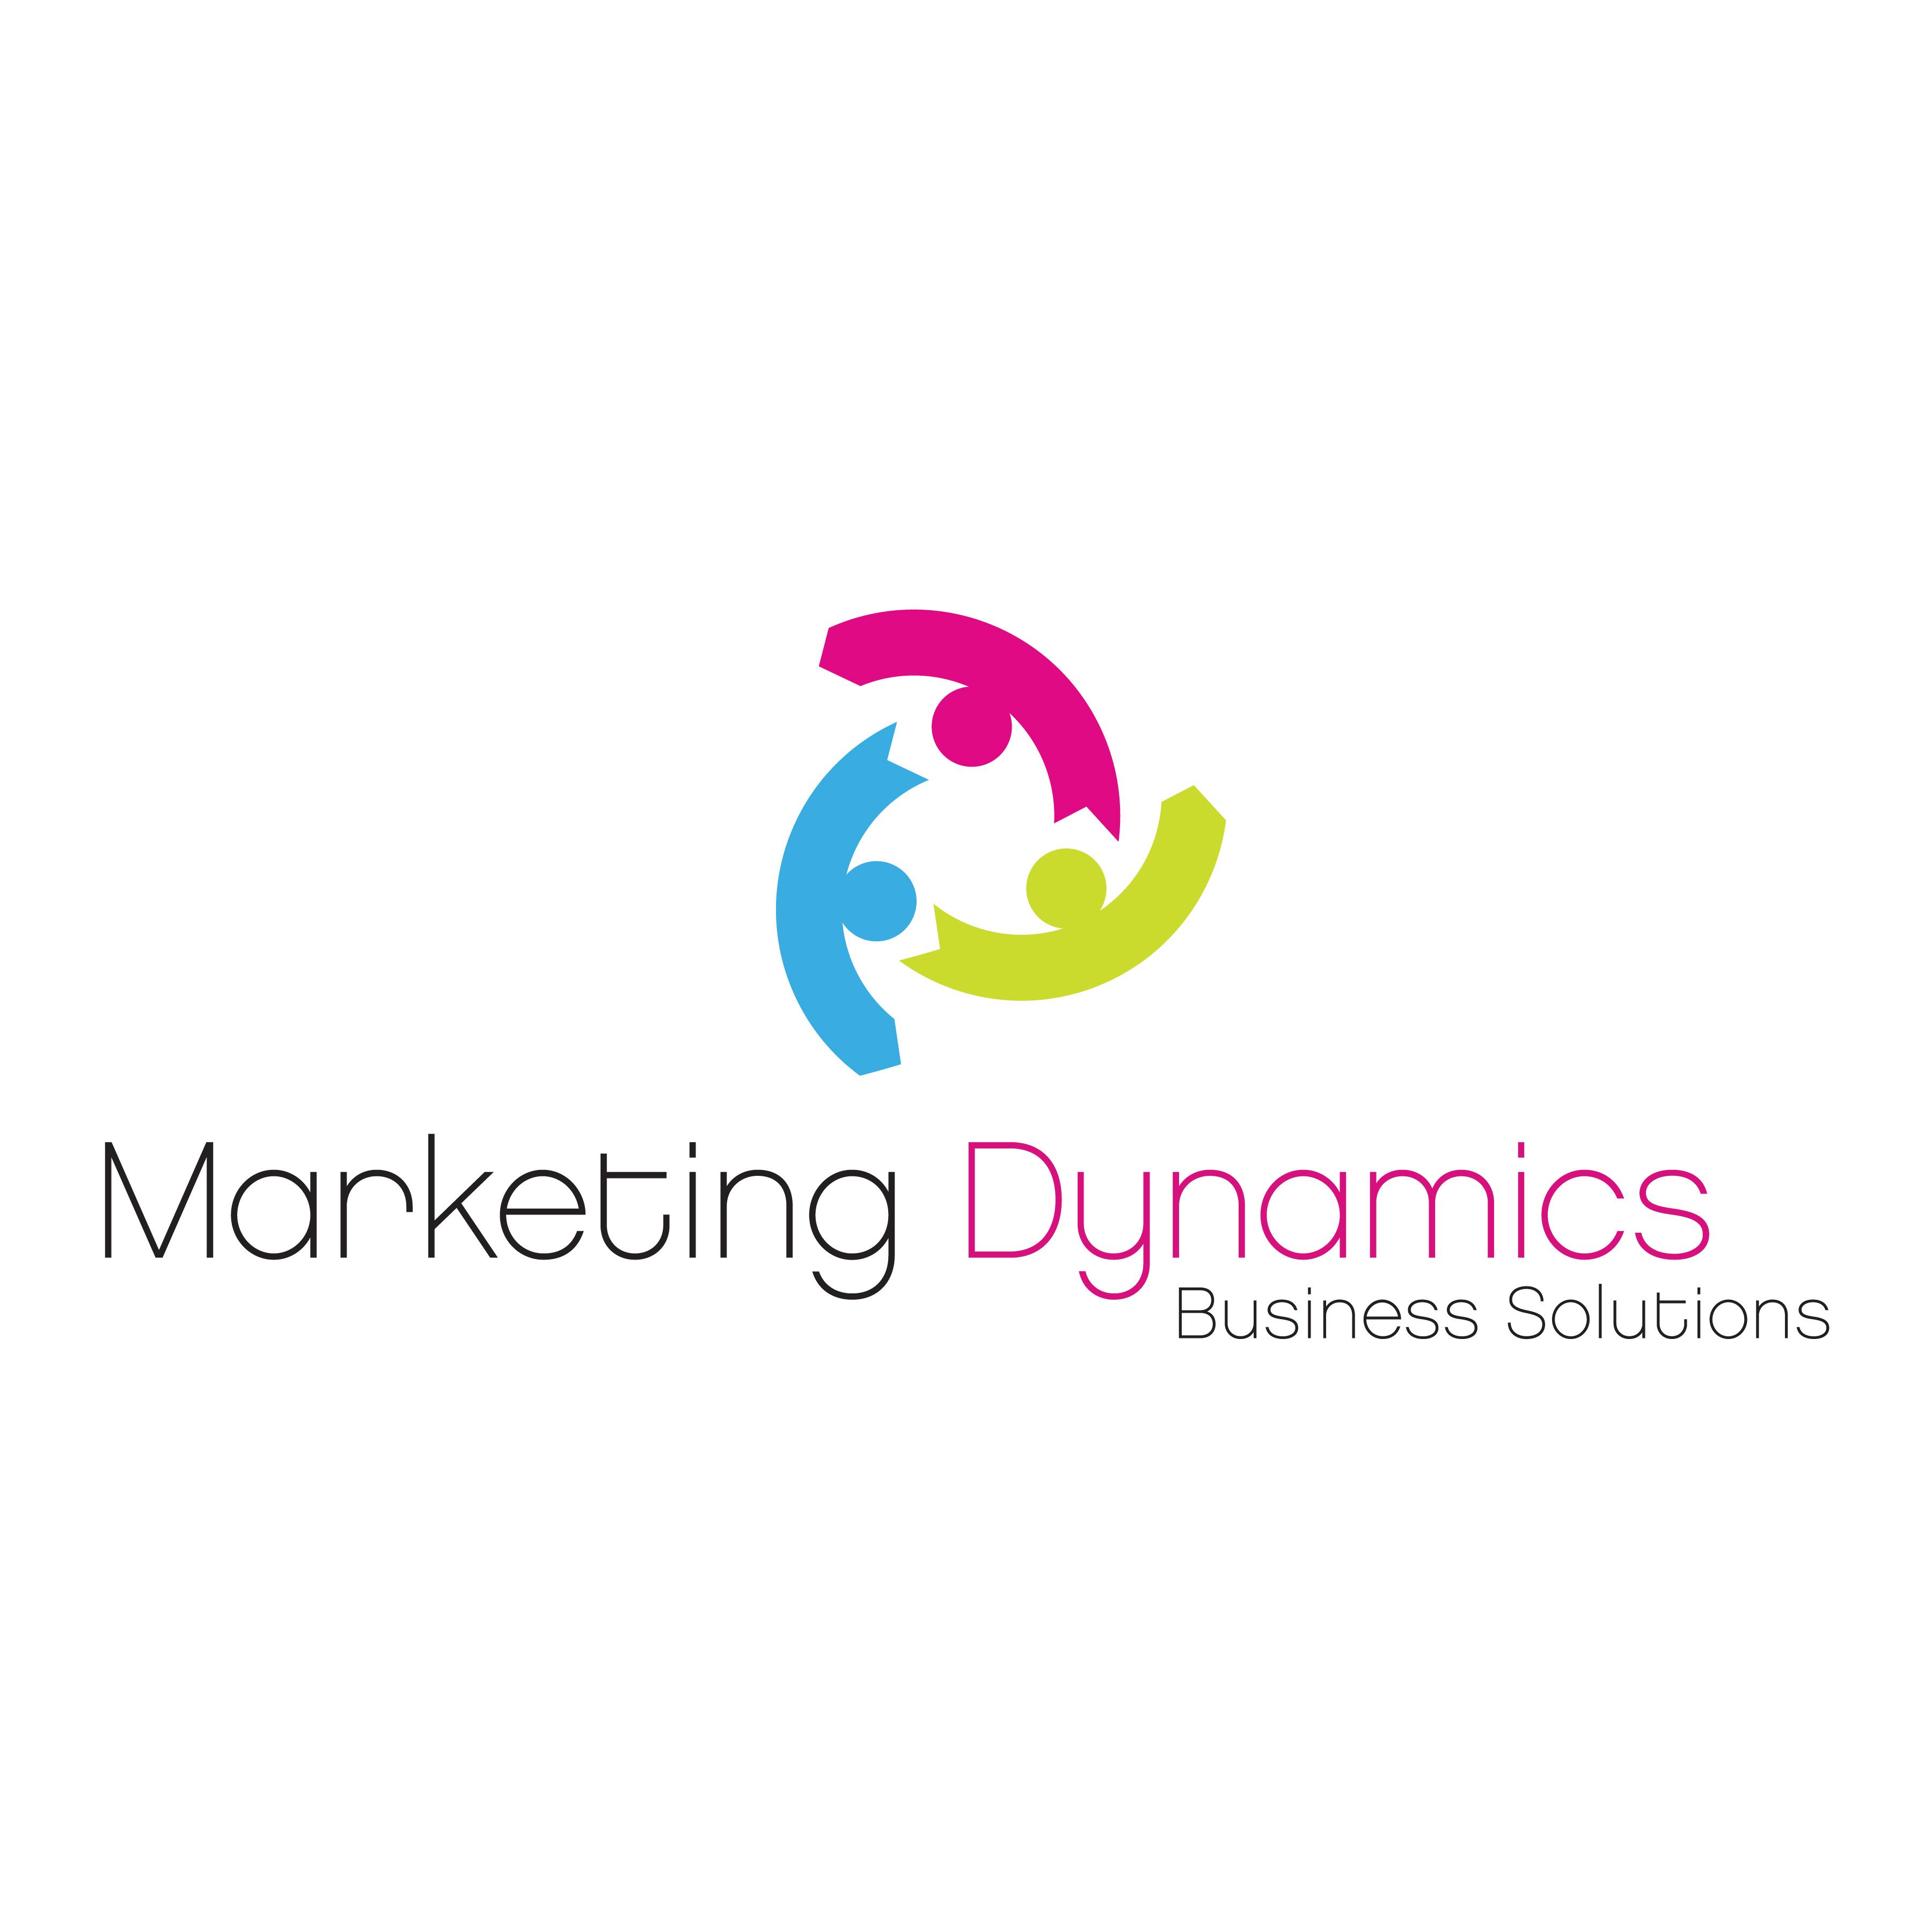 Marketing Dynamic Business